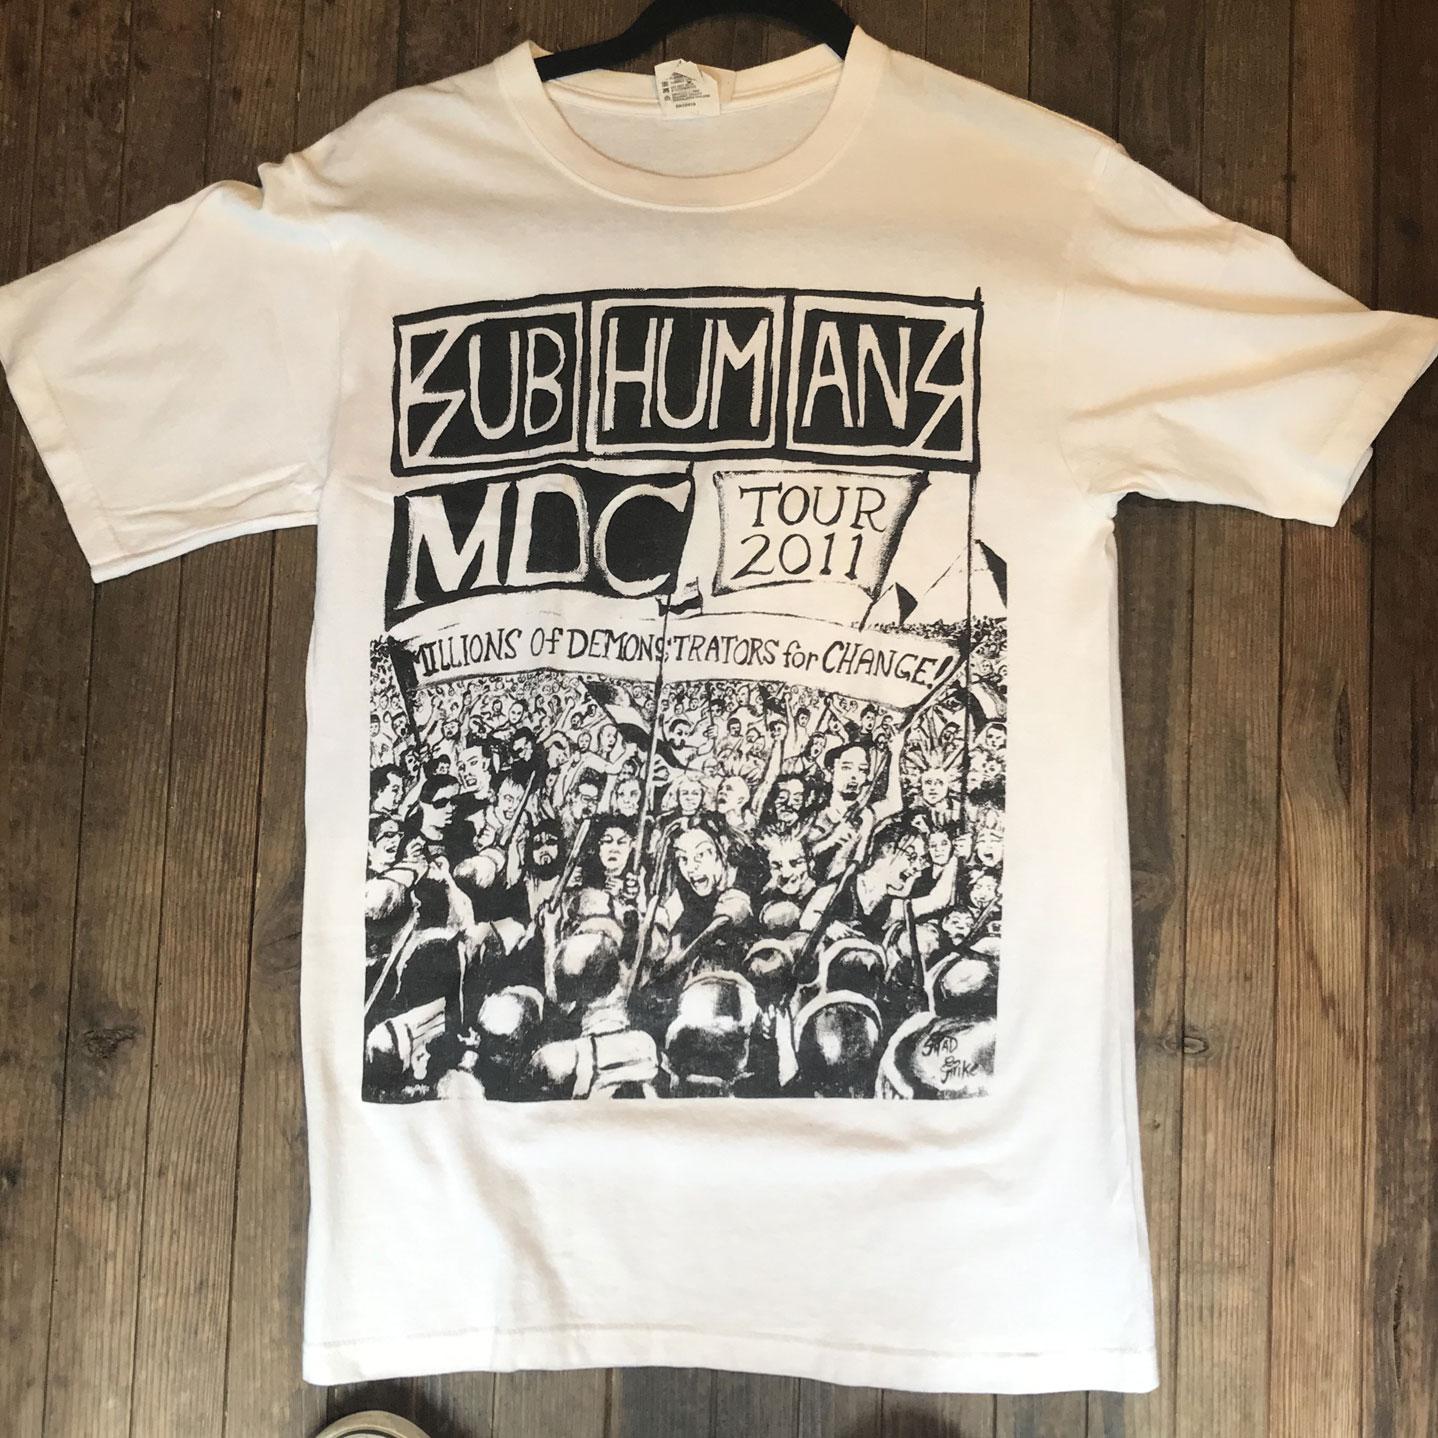 USED! SUBHUMANS MDC Tシャツ TOUR 2011